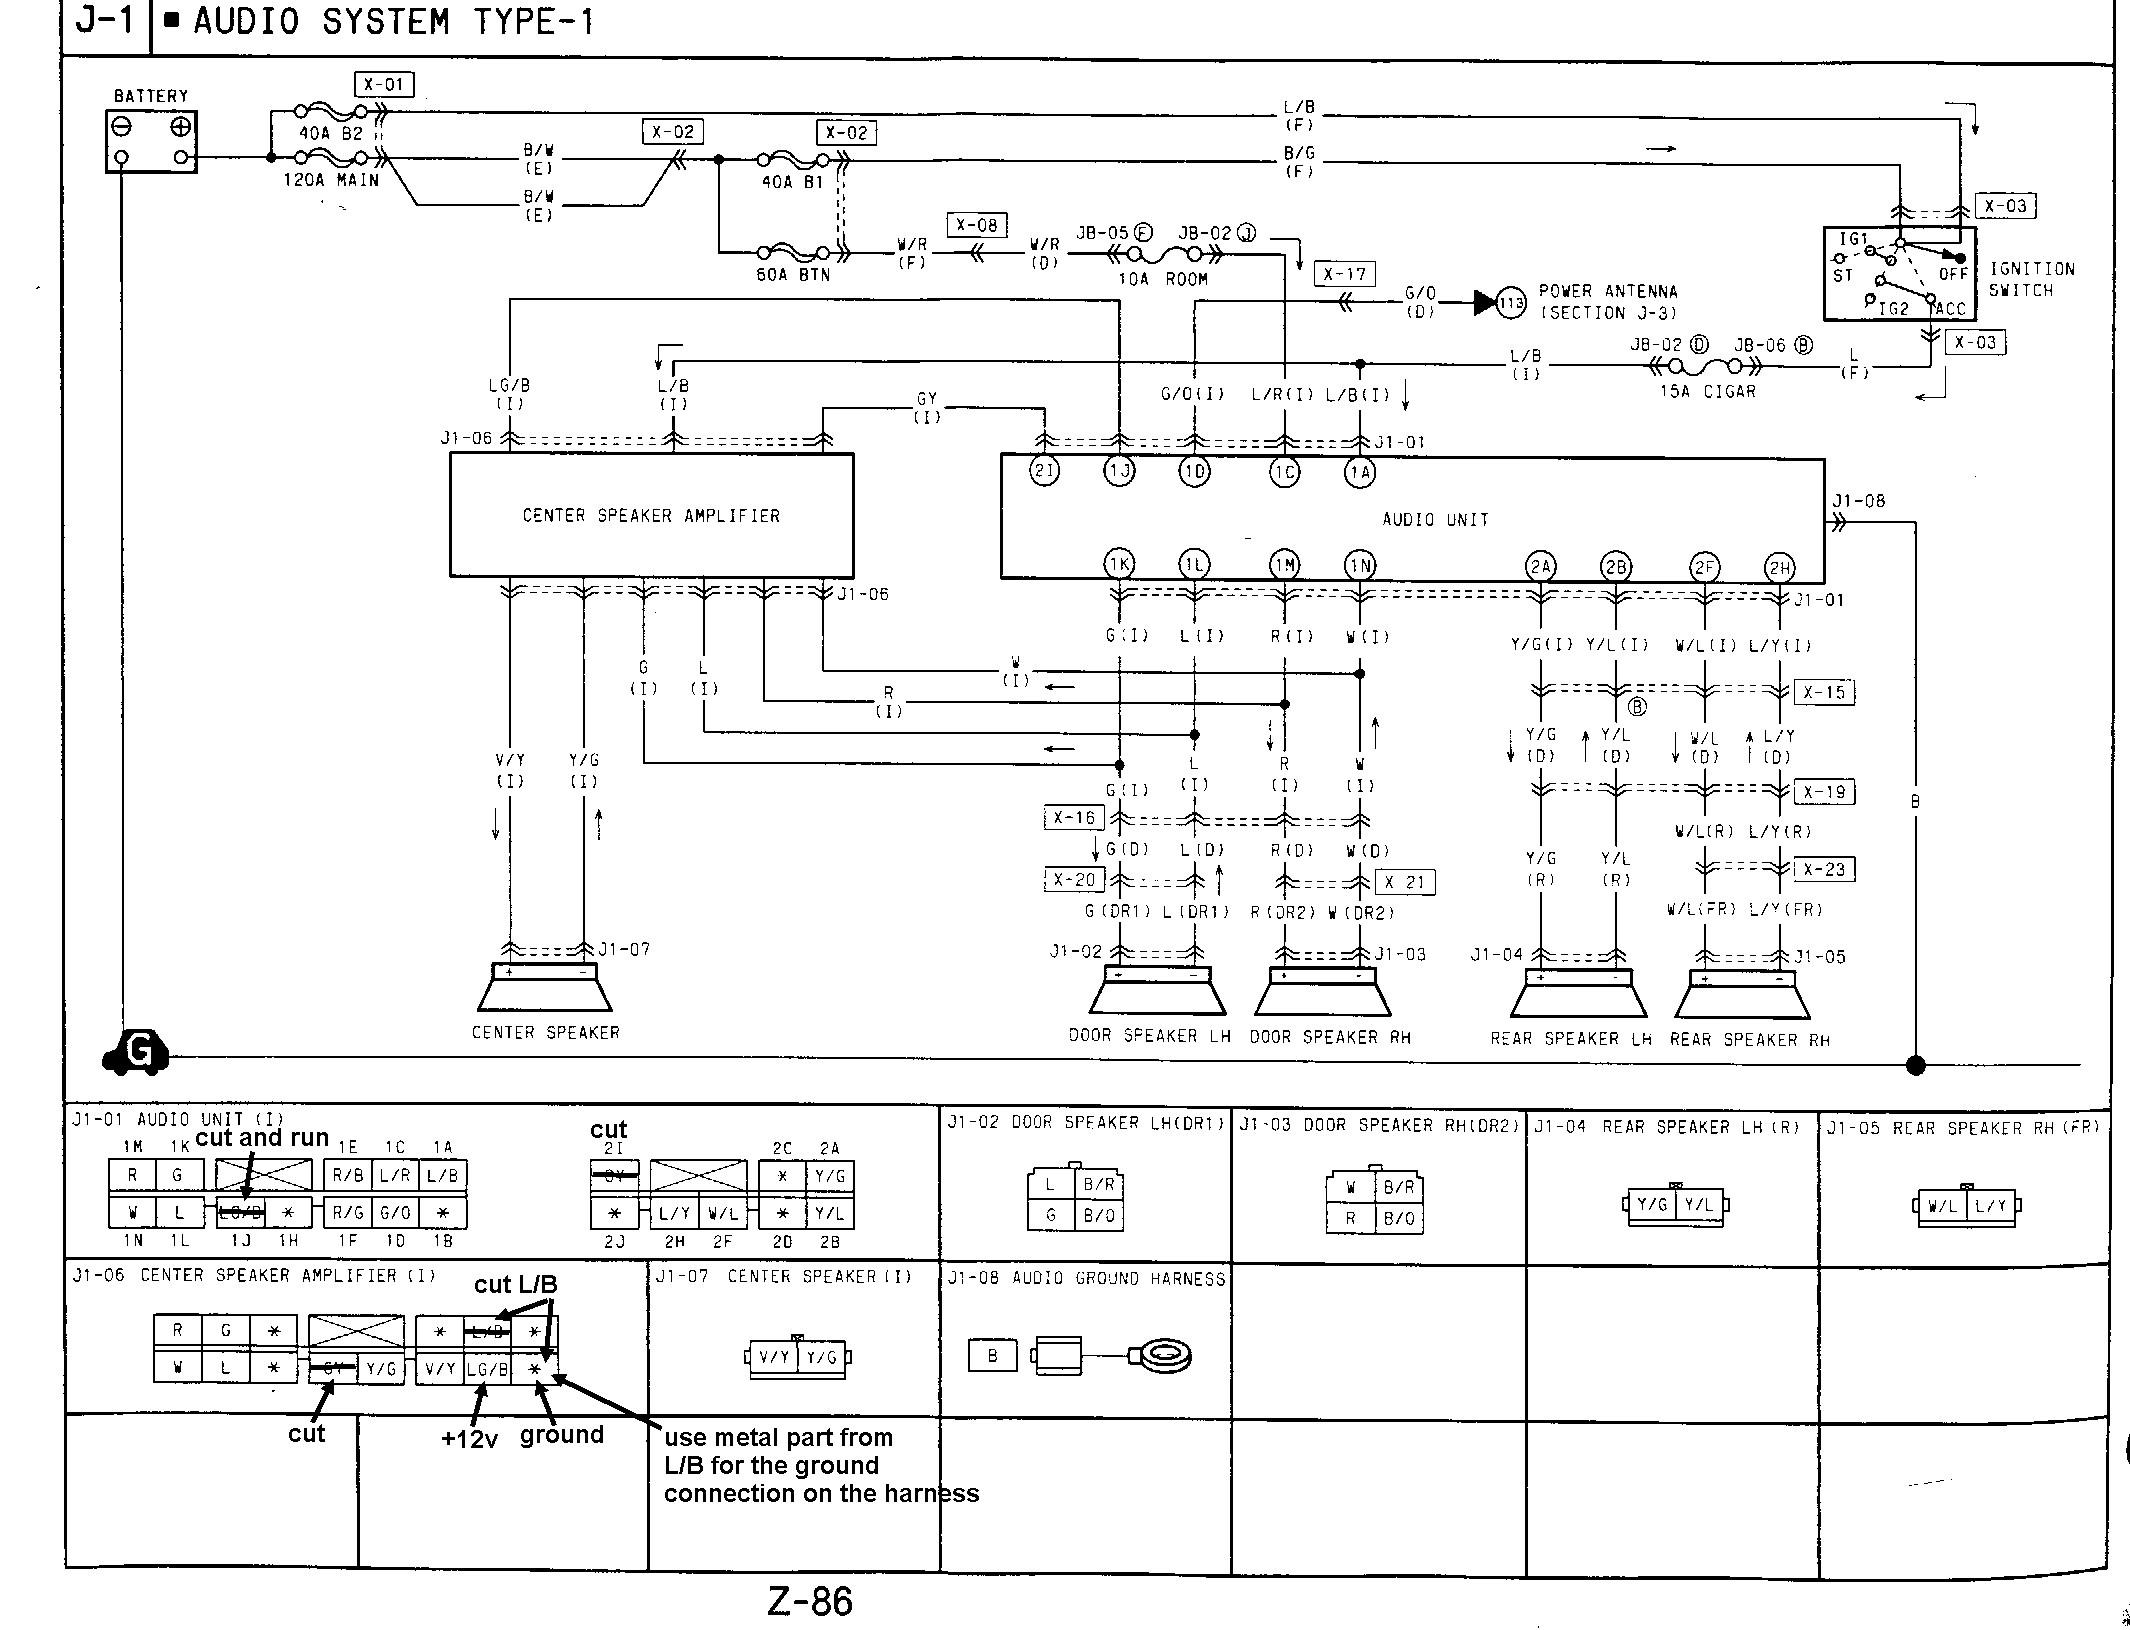 Audi A4 Symphony Ii Wiring Diagram - Renault Clio Fuse Box Manual | Bege Wiring  Diagram | Audi A4 Symphony Ii Wiring Diagram |  | Bege Place Wiring Diagram - Bege Wiring Diagram